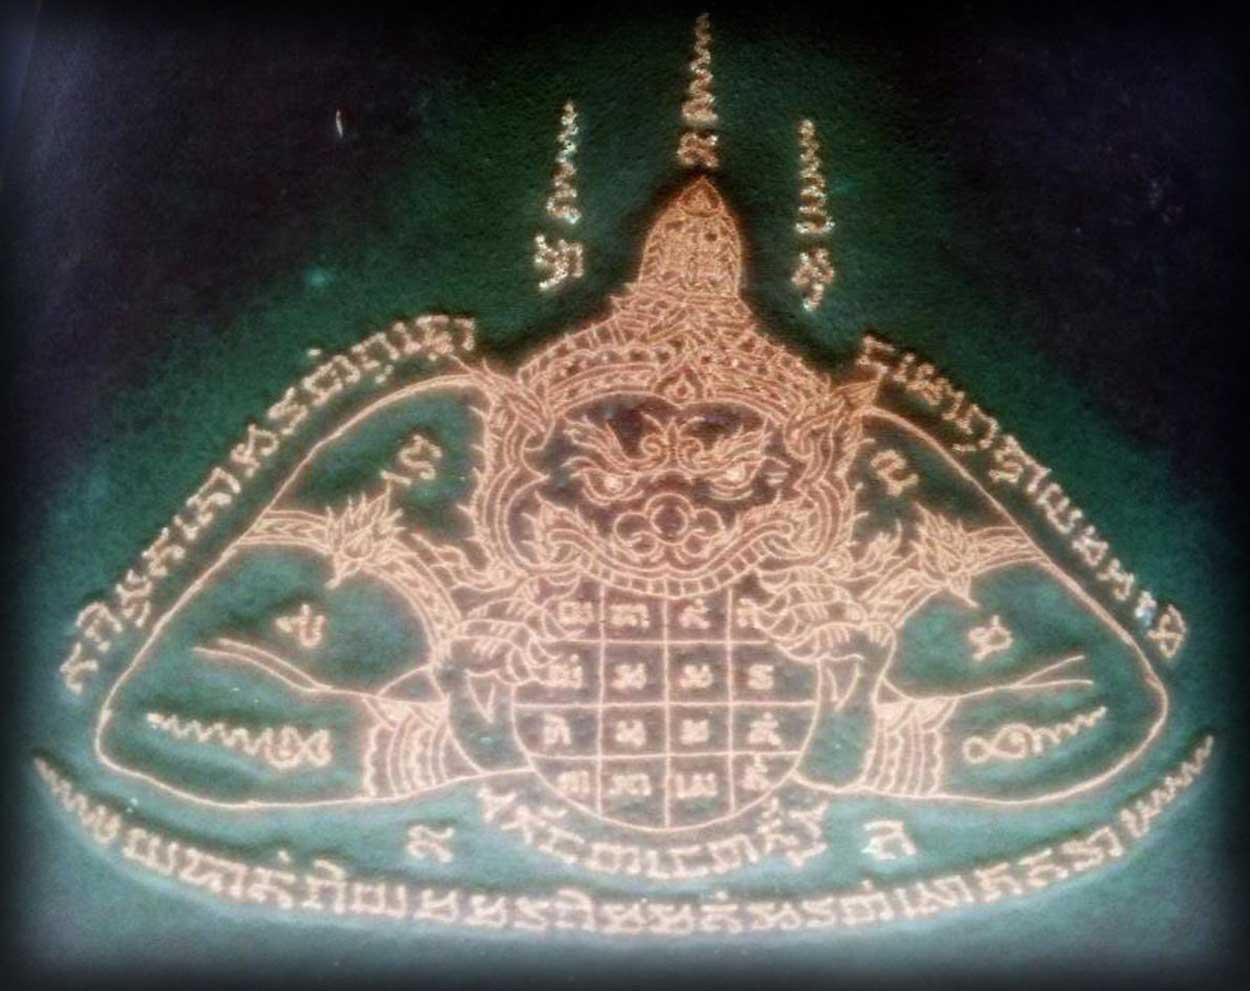 Yant Pra Rahu Om Jantr Eclipse God Swallowing Moon and Sun